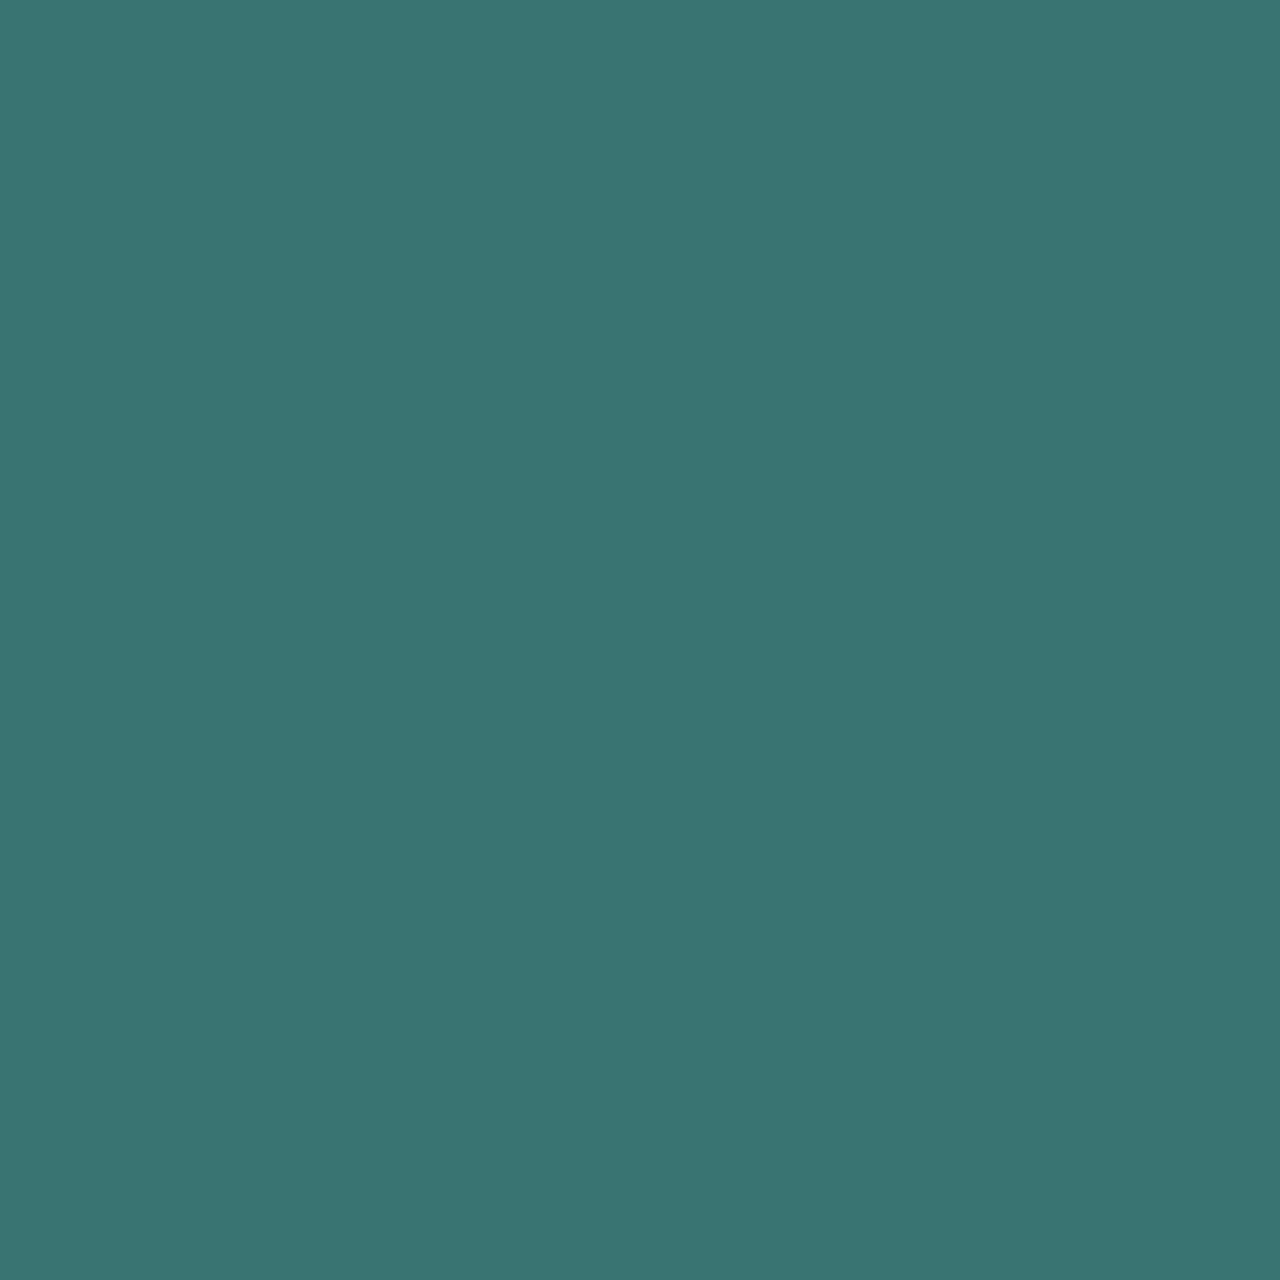 "#4390 Rosco Gels Roscolux CalColor 90 Cyan, 20x24"""